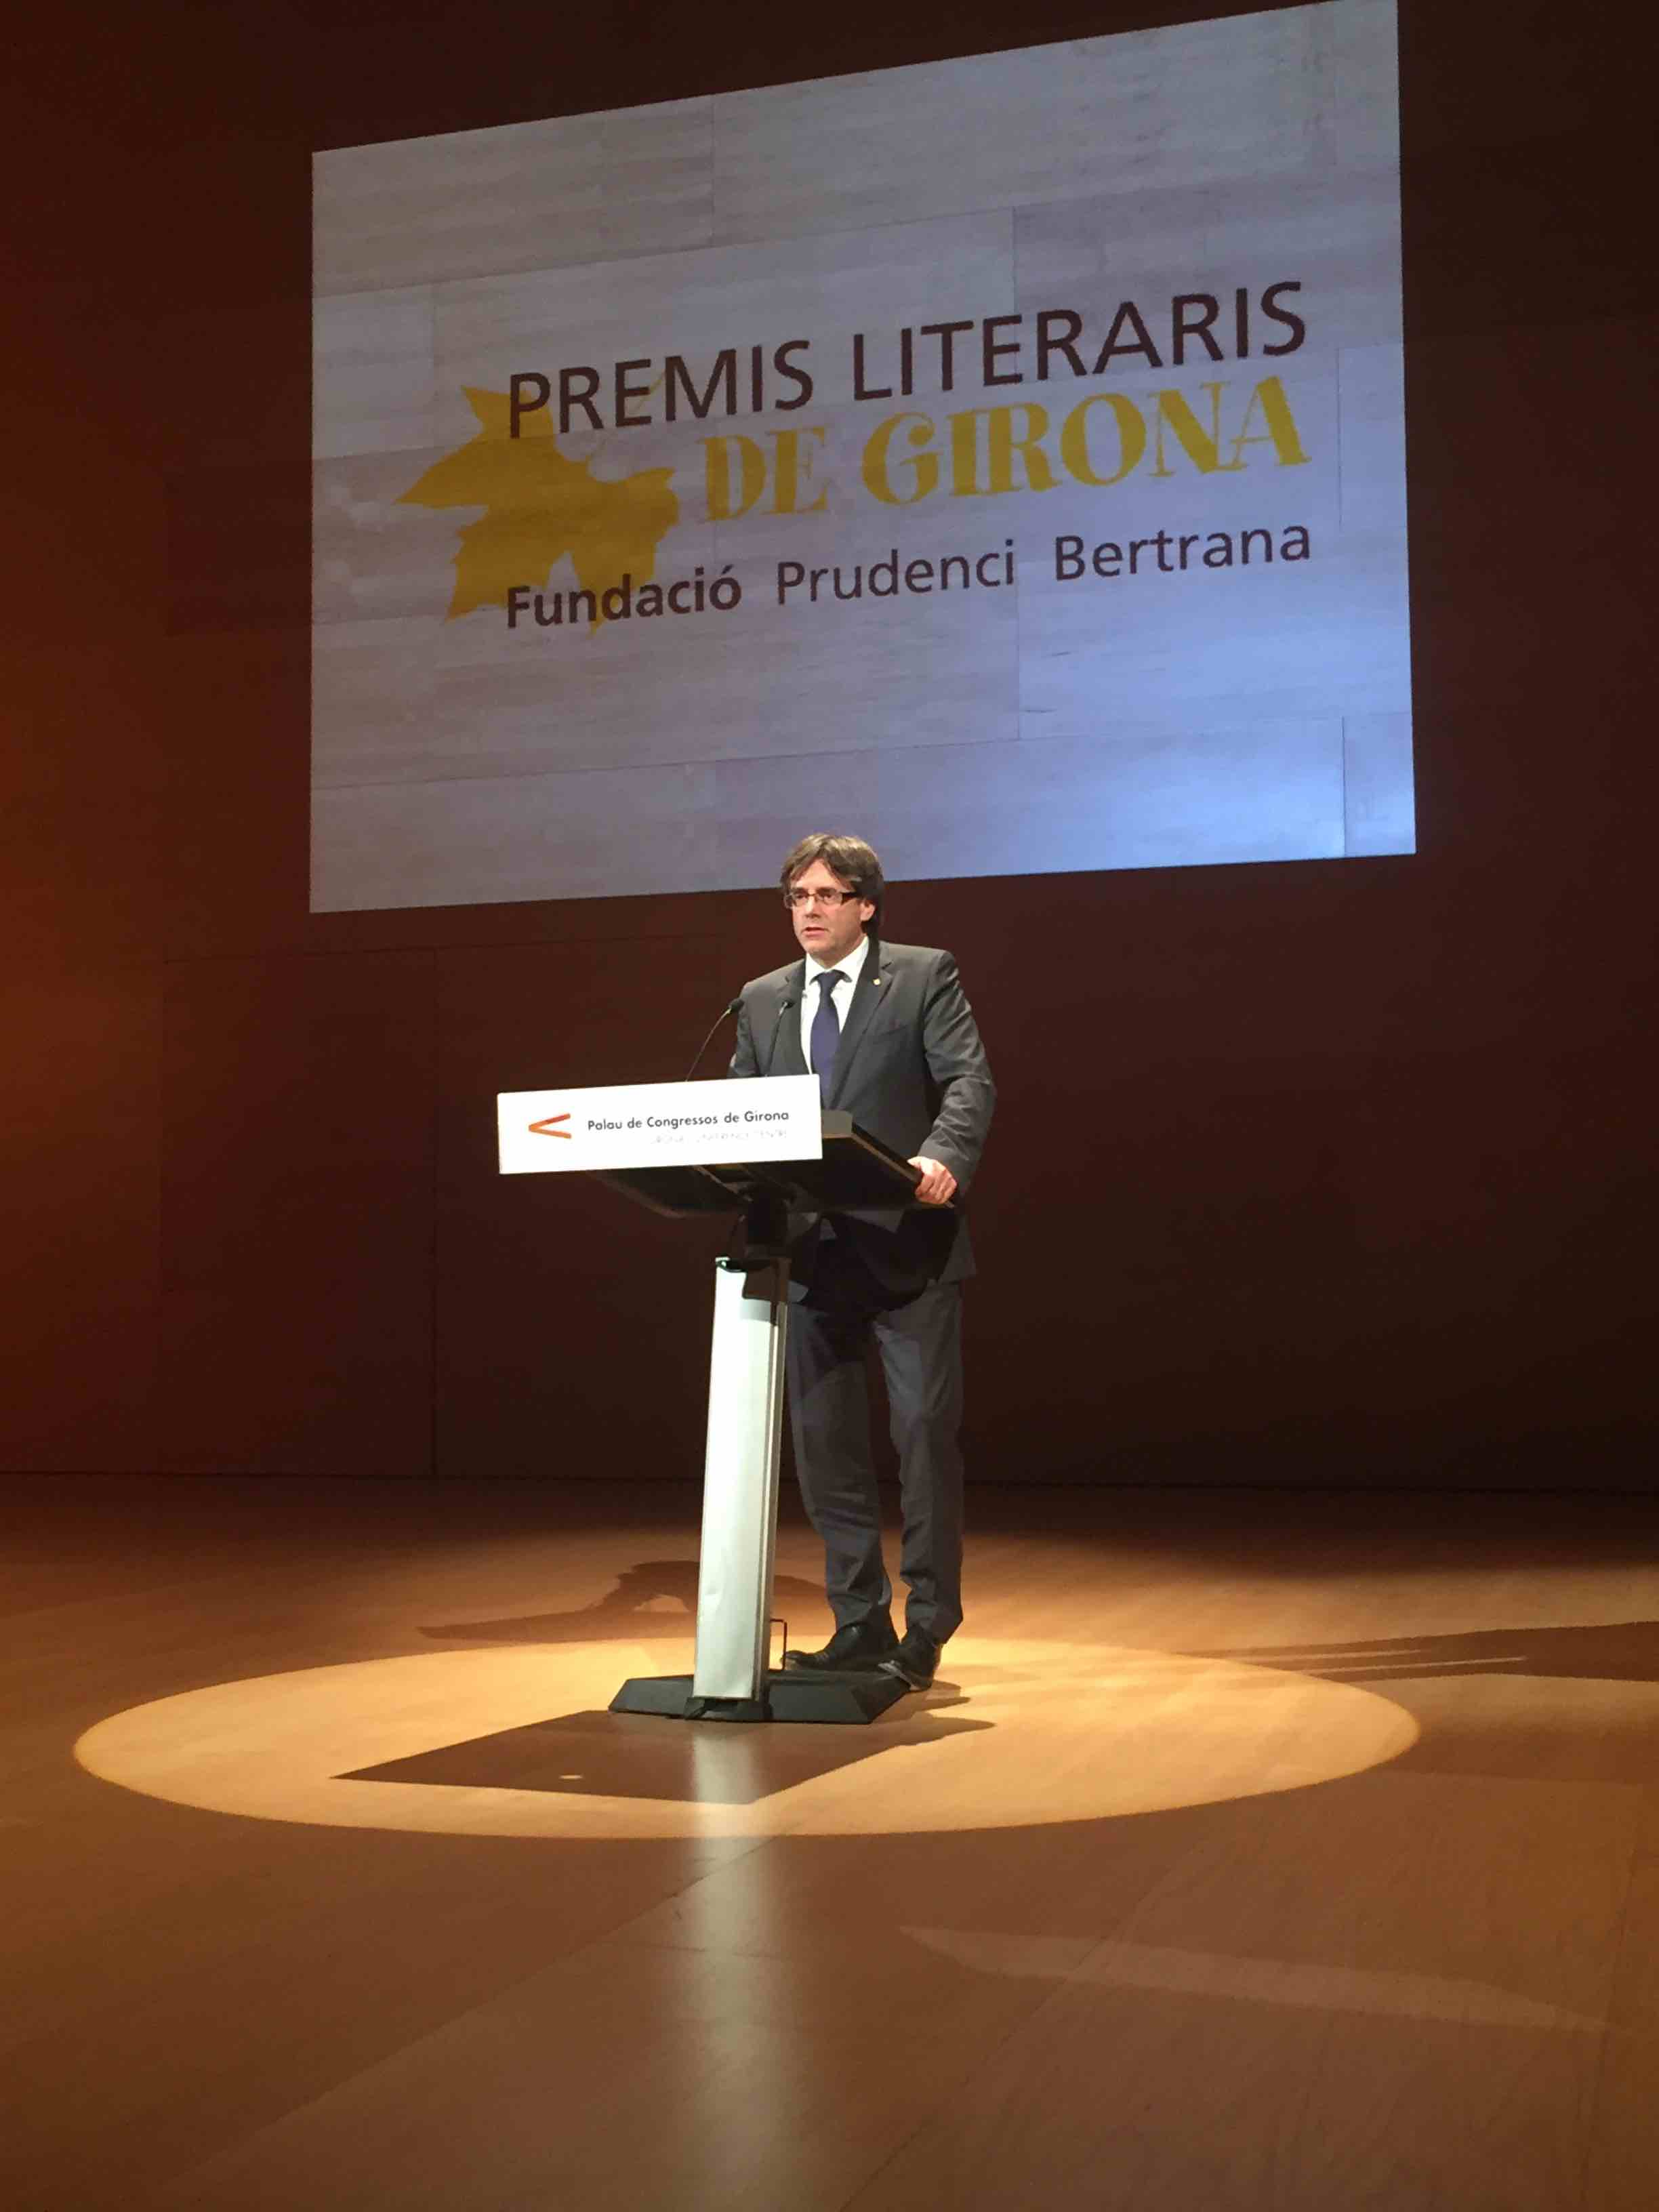 premis-literaris-de-girona-2016-1